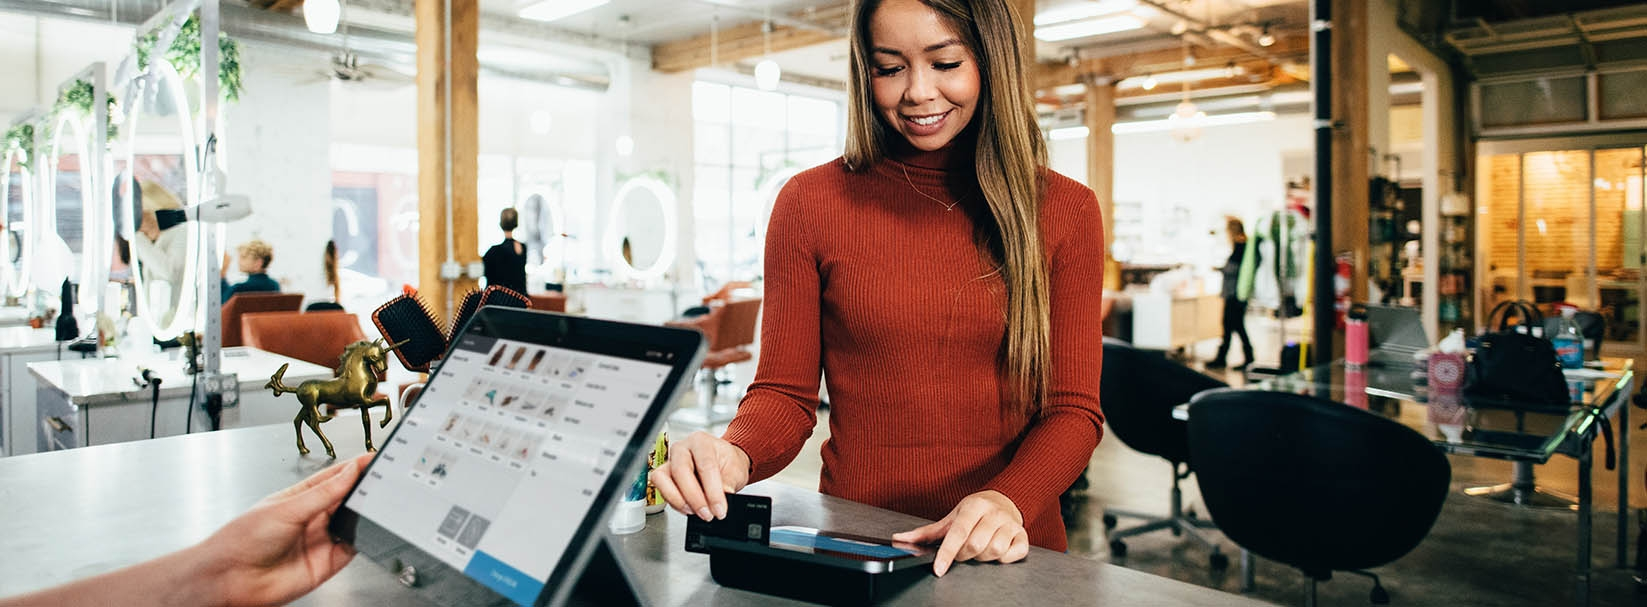 Creativity is key when repurposing retail